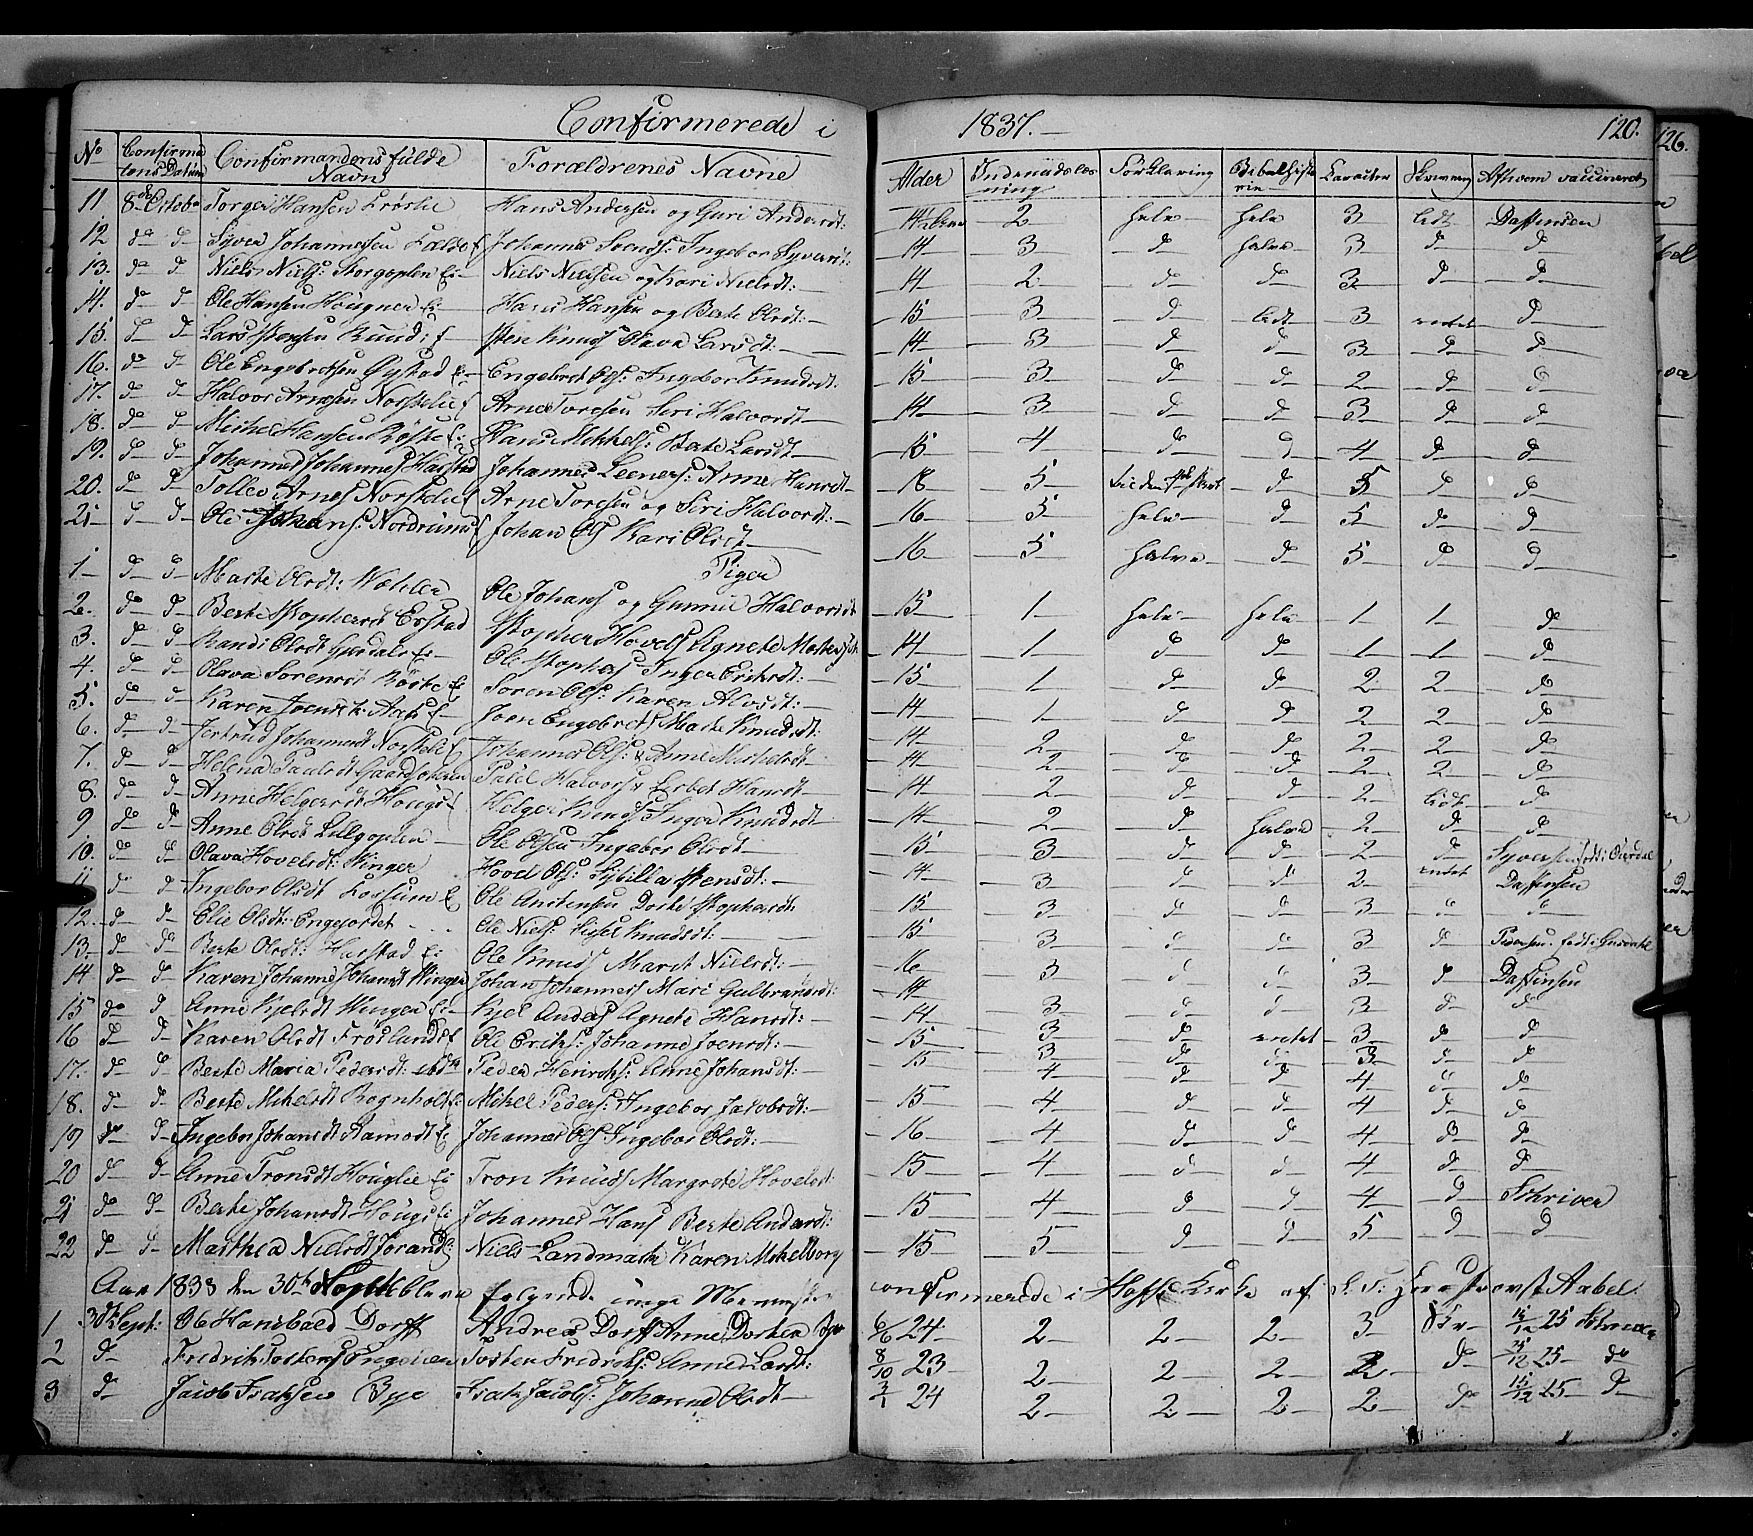 SAH, Land prestekontor, Klokkerbok nr. 2, 1833-1849, s. 120